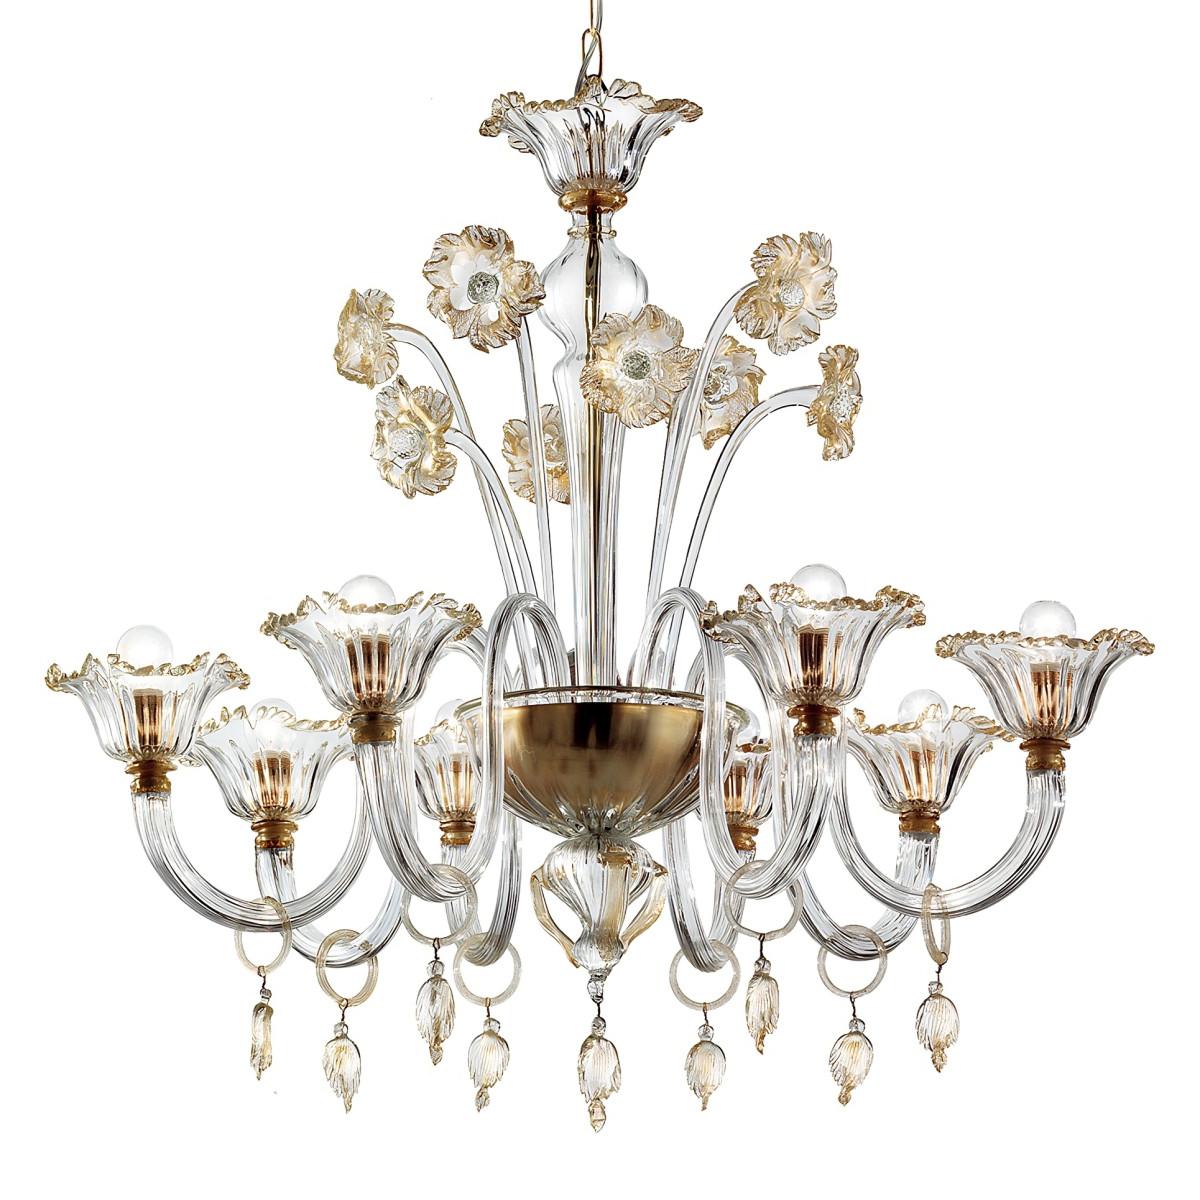 Novecento 8 luces lampara de Murano - color transparente oro